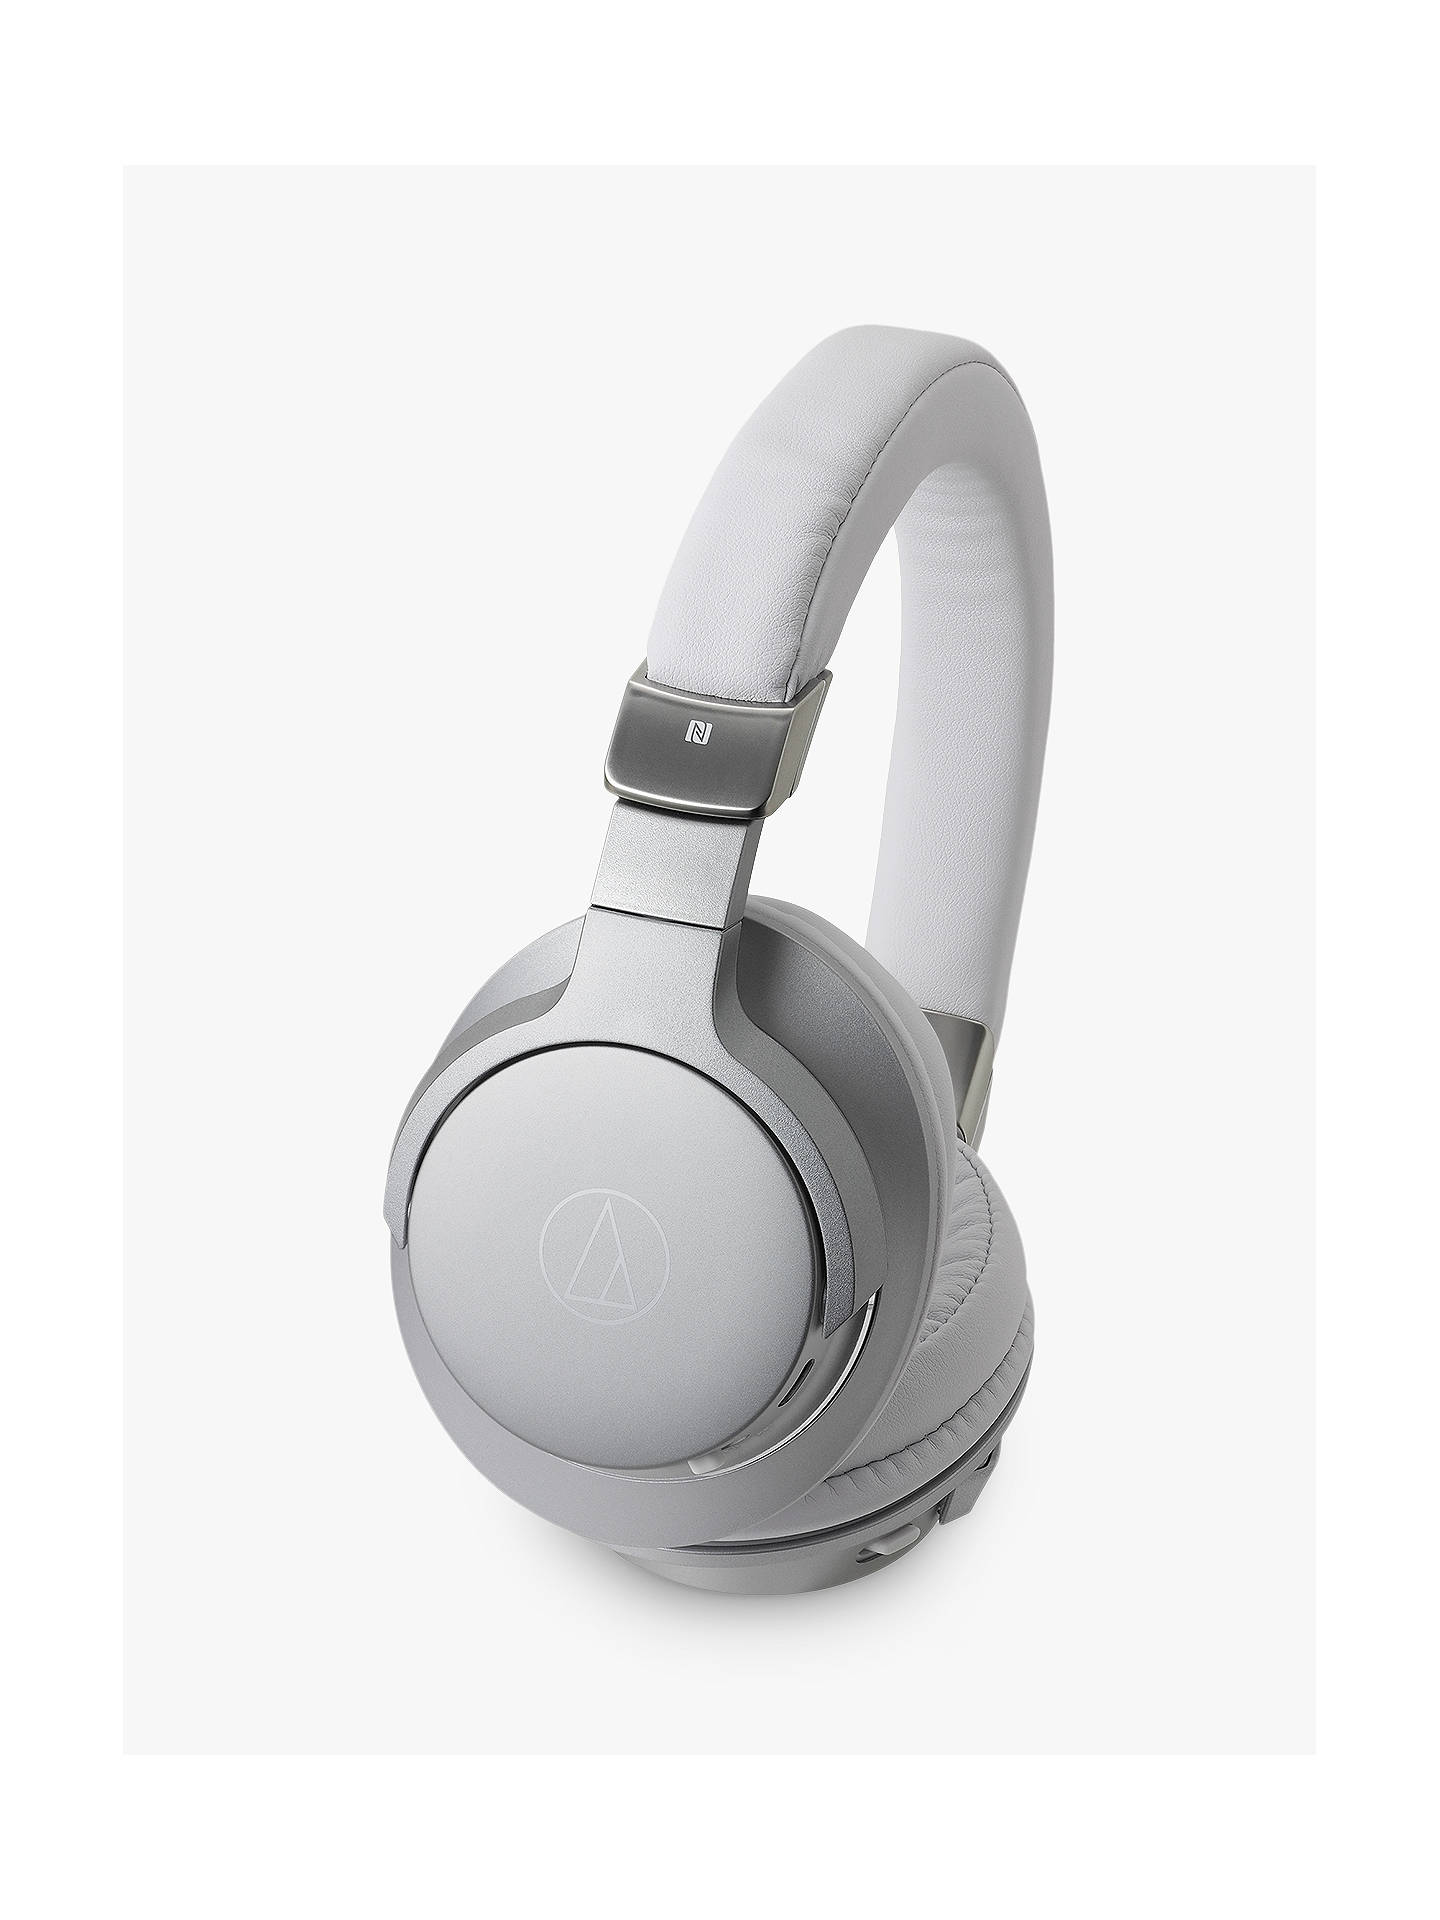 d31b5fe465cf92 Buy Audio-Technica ATH-AR5BT Wireless Bluetooth NFC Over-Ear Headphones,  White